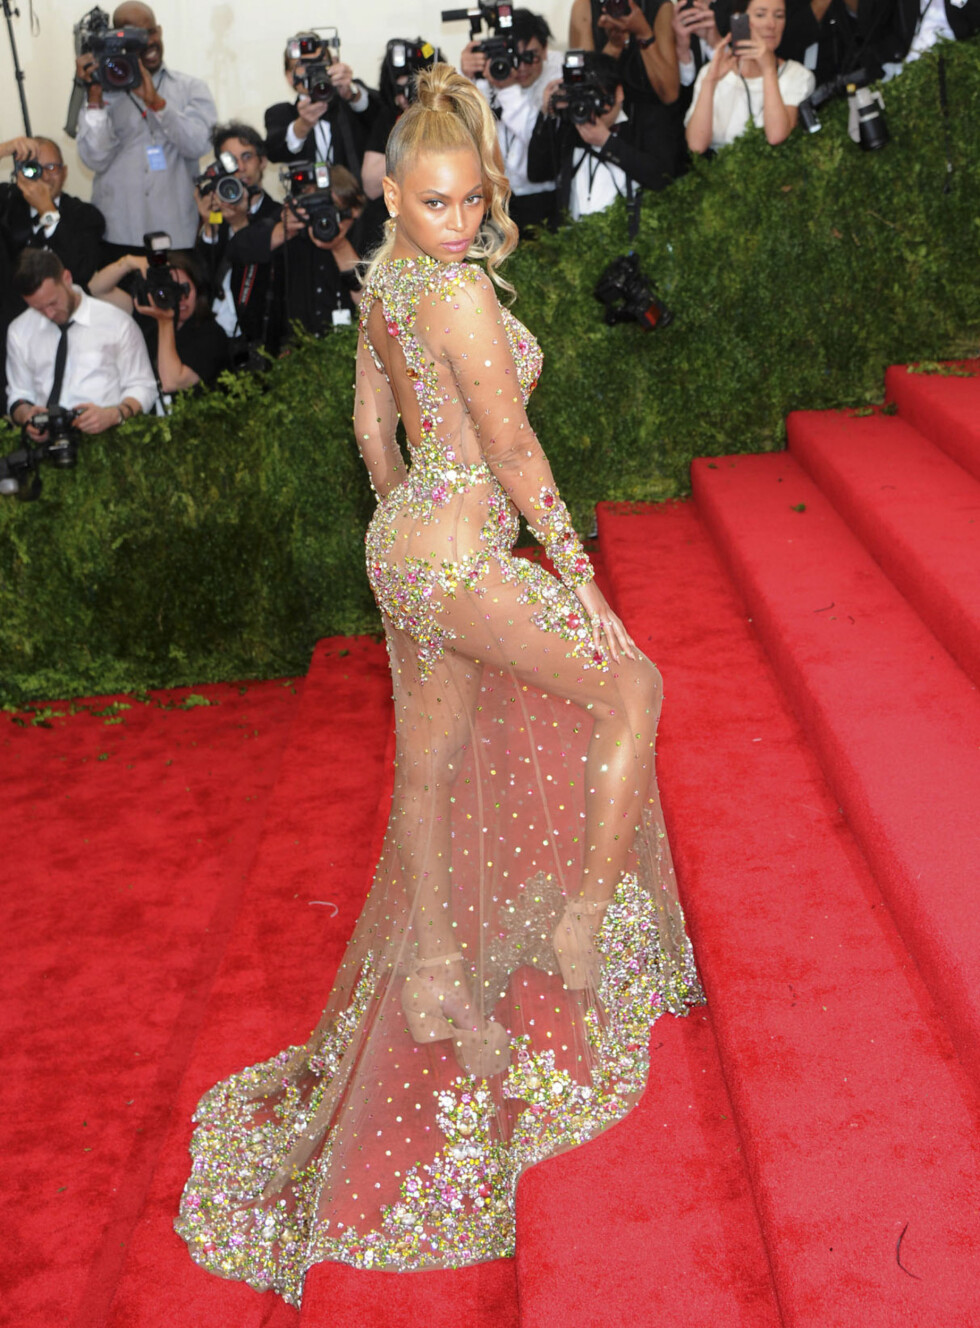 POSERER: Beyoncé fotografert under The Met Gala i New York i 2015. Foto: NTB Scanpix